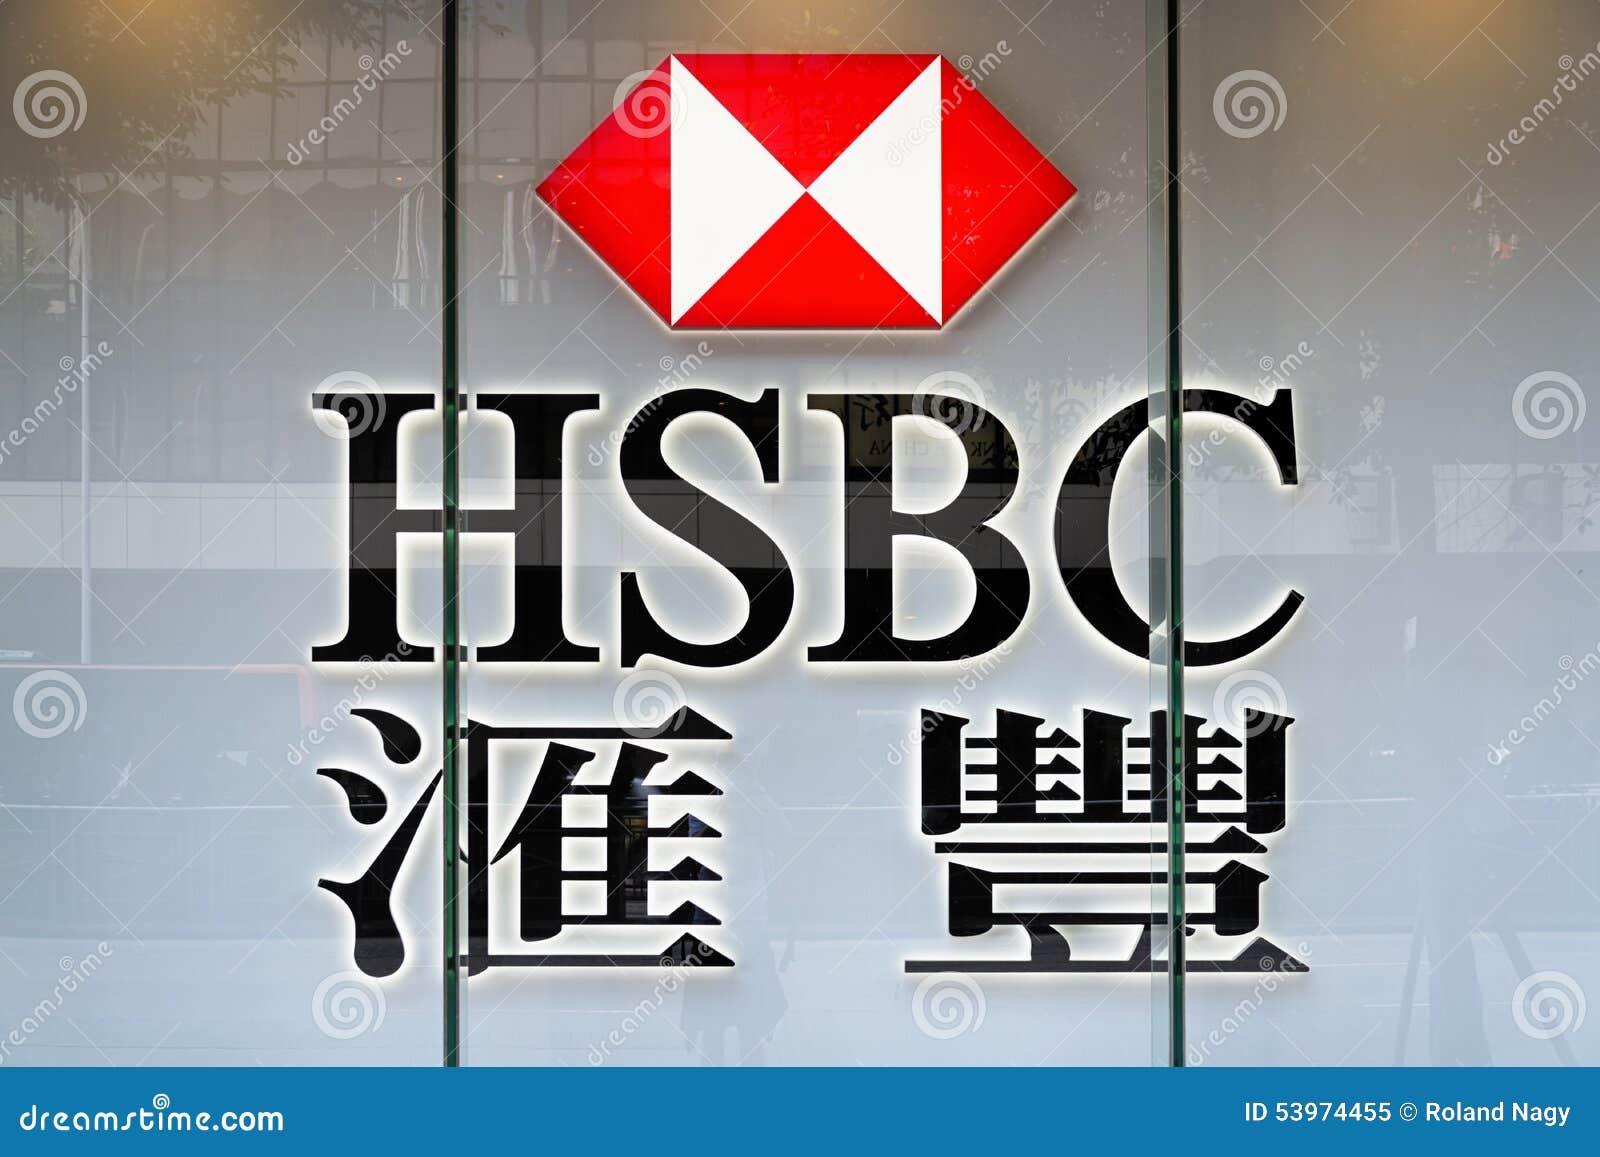 HSBC Bank Sign In Hong Kong Editorial Image - Image of business